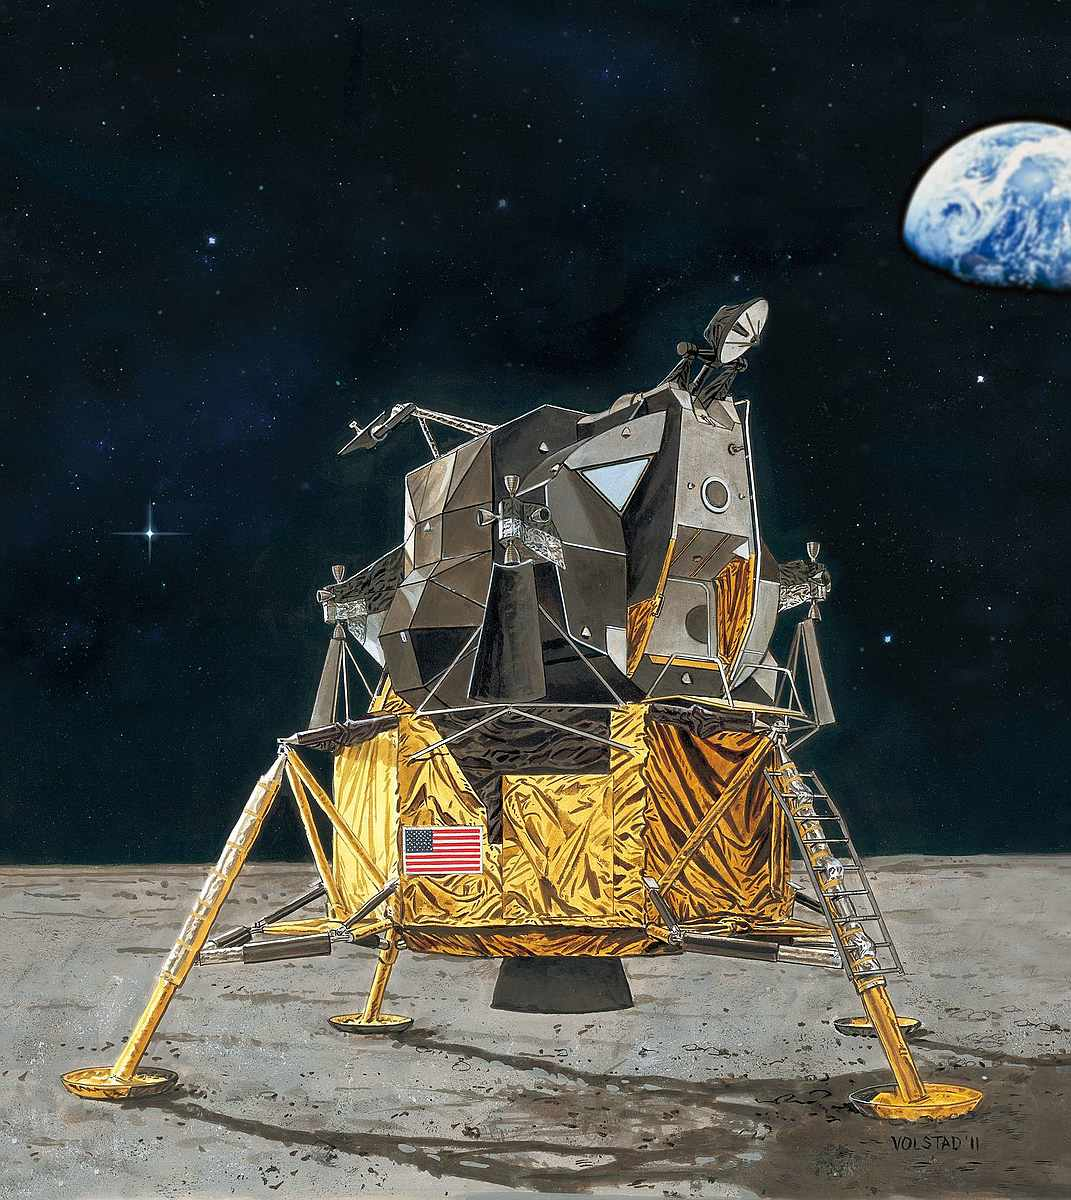 Revell-03701-Apollo-11-Lunar-Module-Eagle-50th-Anniversary-Moon-Landing Revell-Neuheiten im I. Quartal 2019